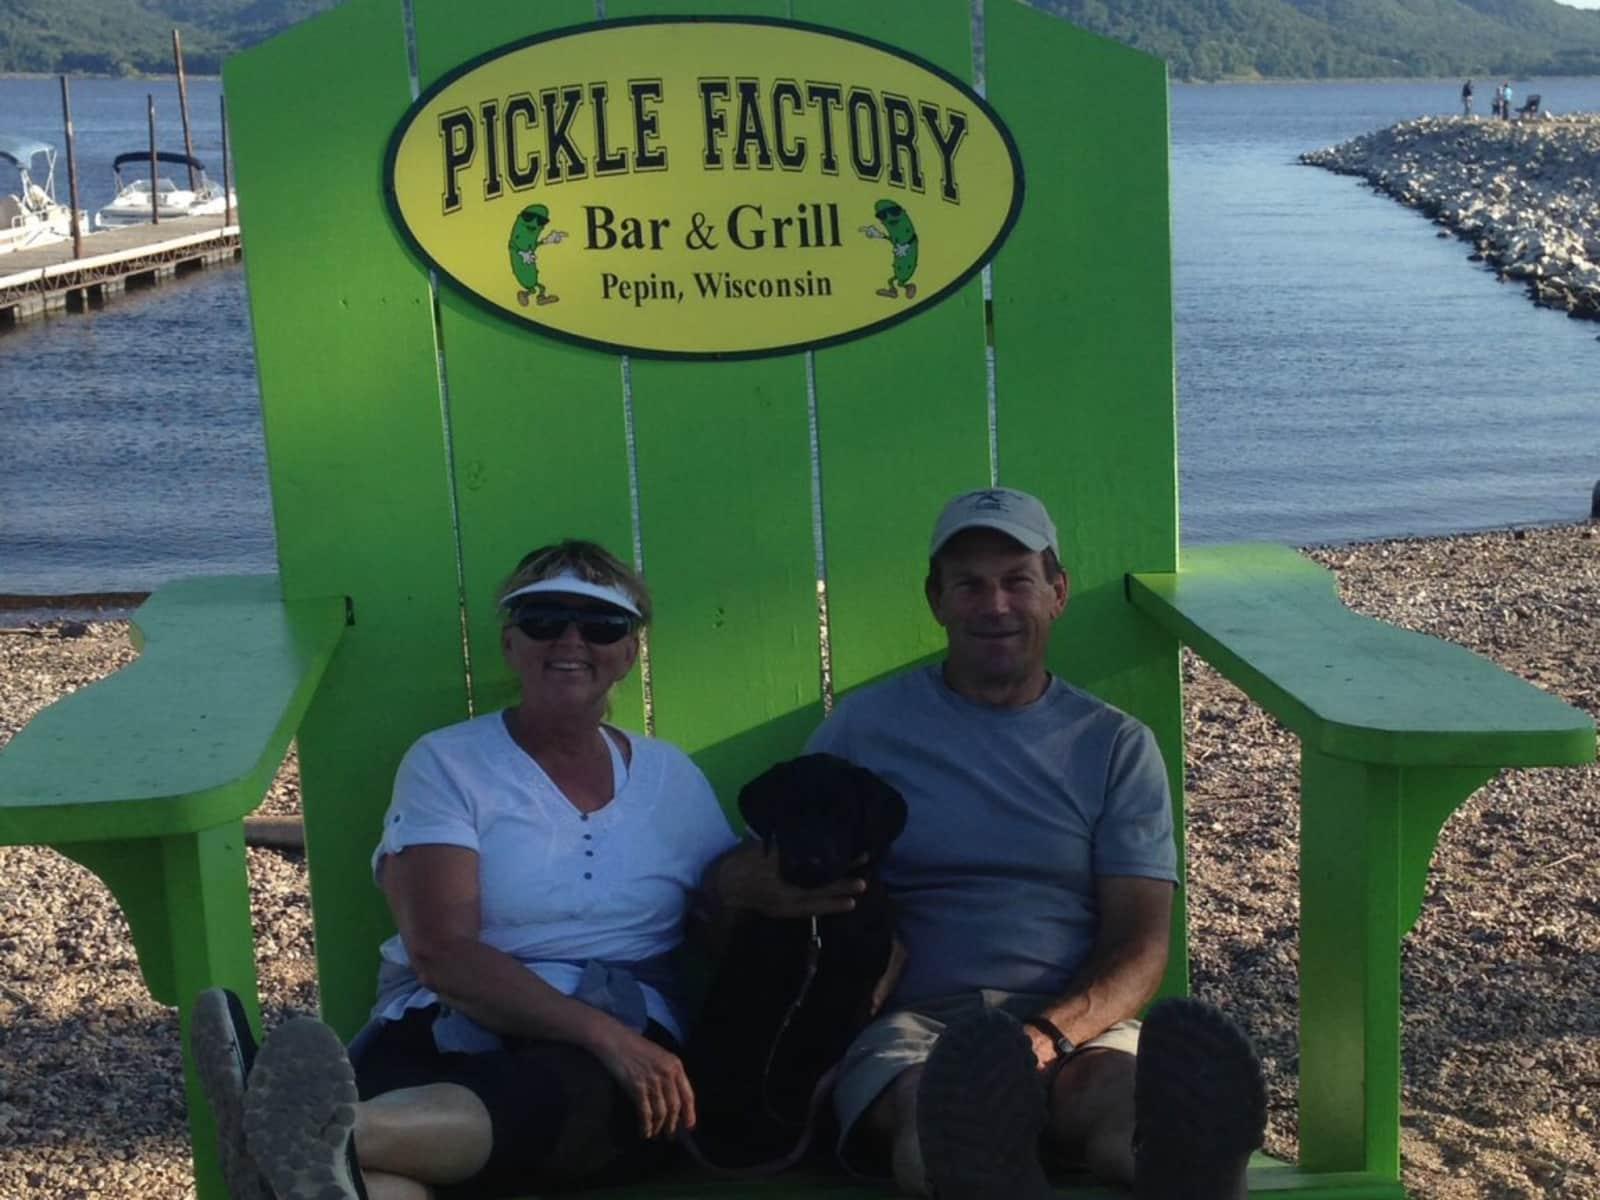 Dennis & sharon & Sharon from Cocoa Beach, Florida, United States